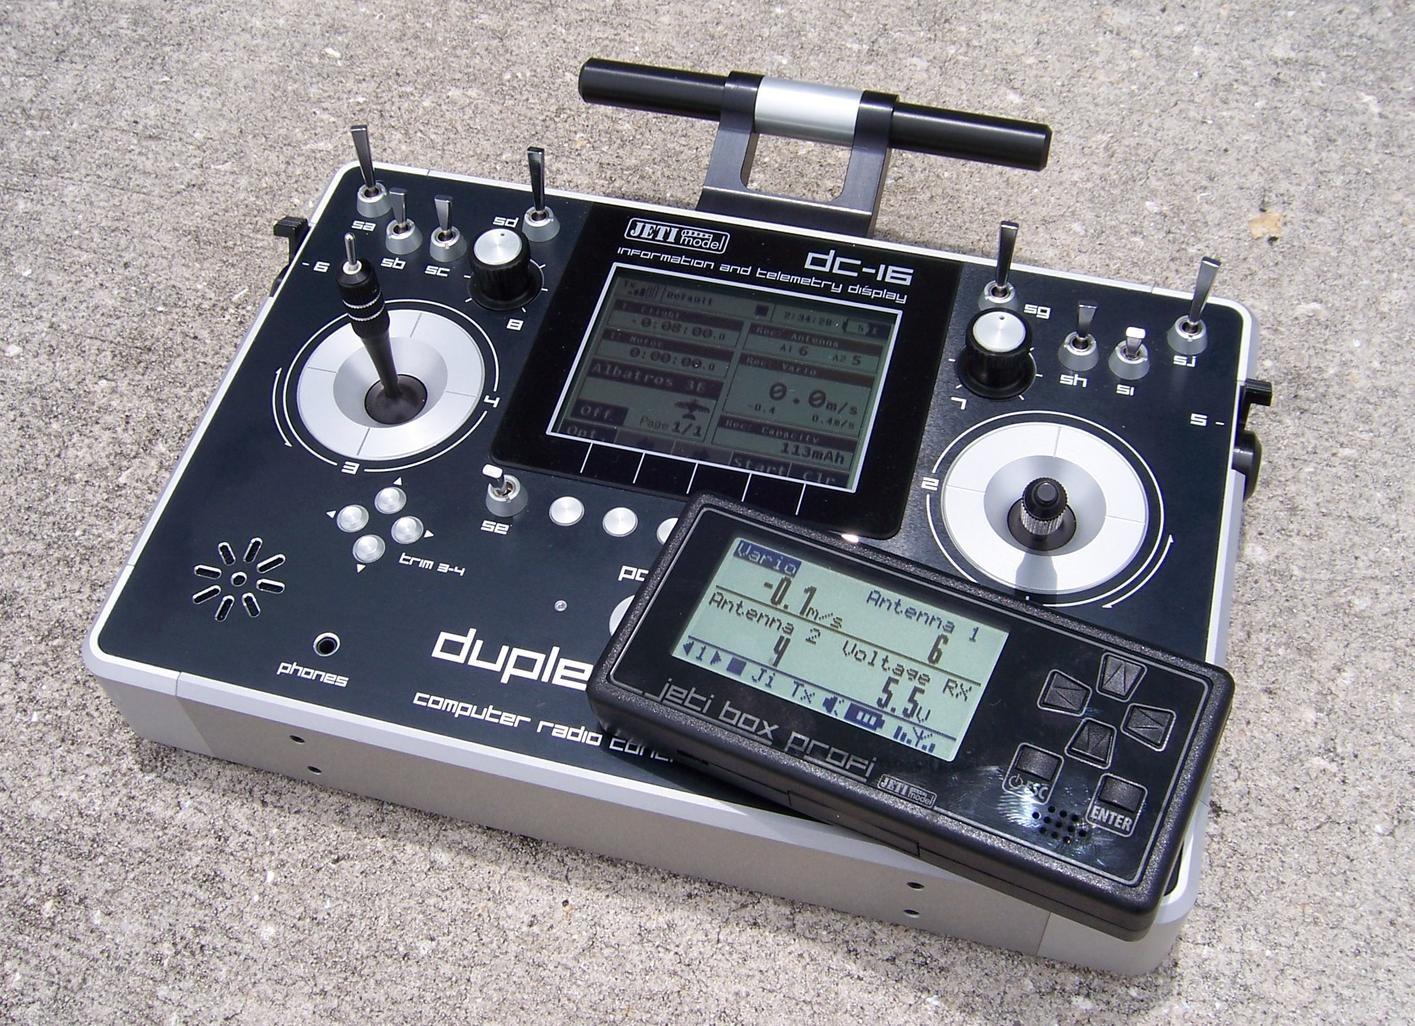 Vysílač Duplex DC-16 EX M1